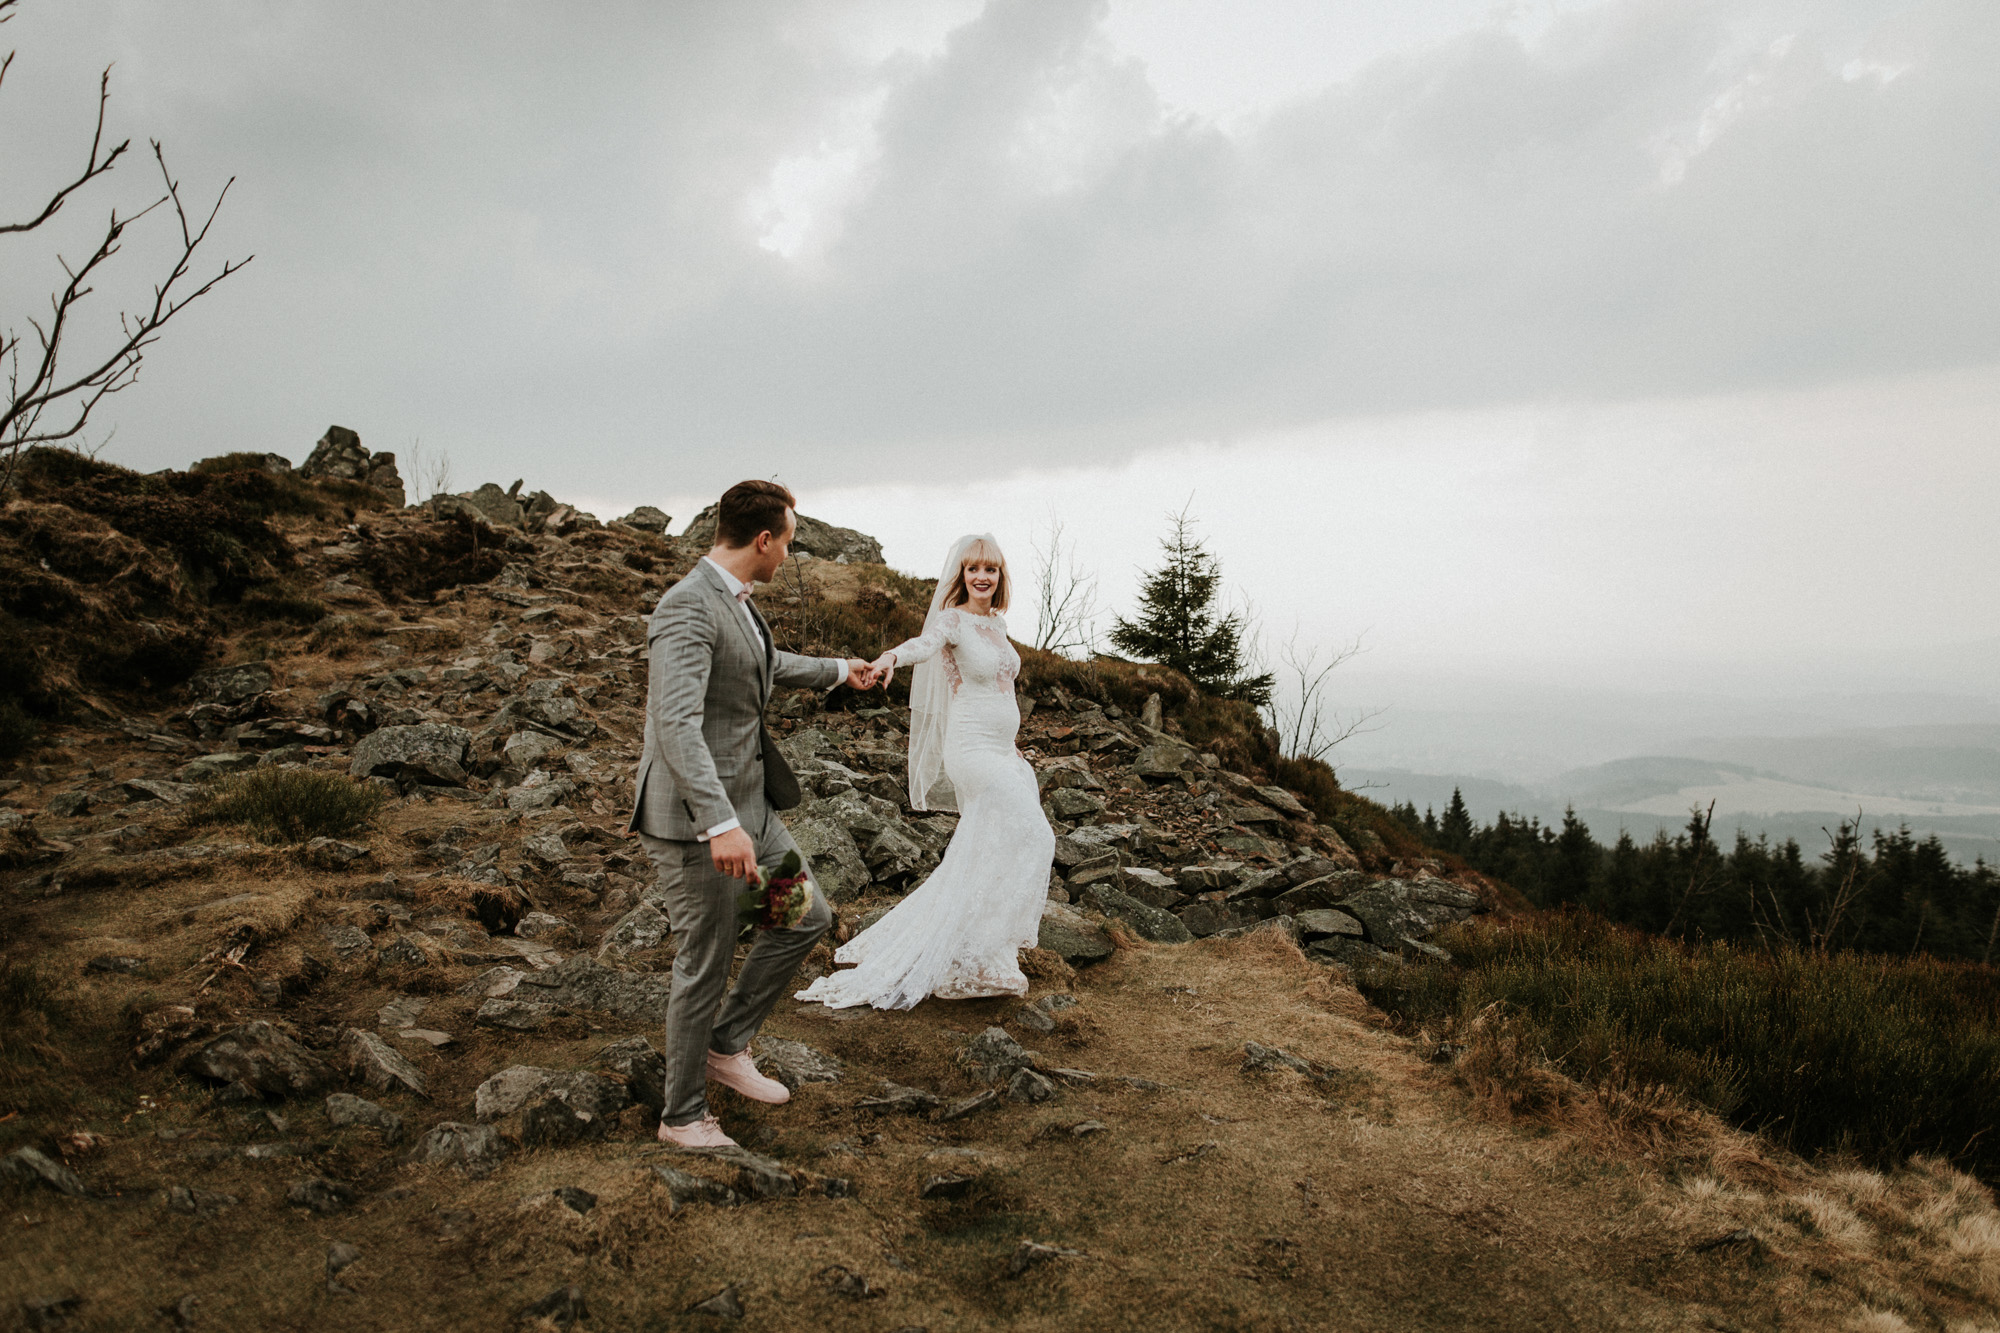 DanielaMarquardtPhotography_Hochzeitsfotograf_Düsseldorf_Köln_Mallorca_Bayern_Austria_Harz_LinaundMaik_Afterwedding-Shooting_Weddingphotographer_Ibiza_Tuskany_Italien_Toskana60